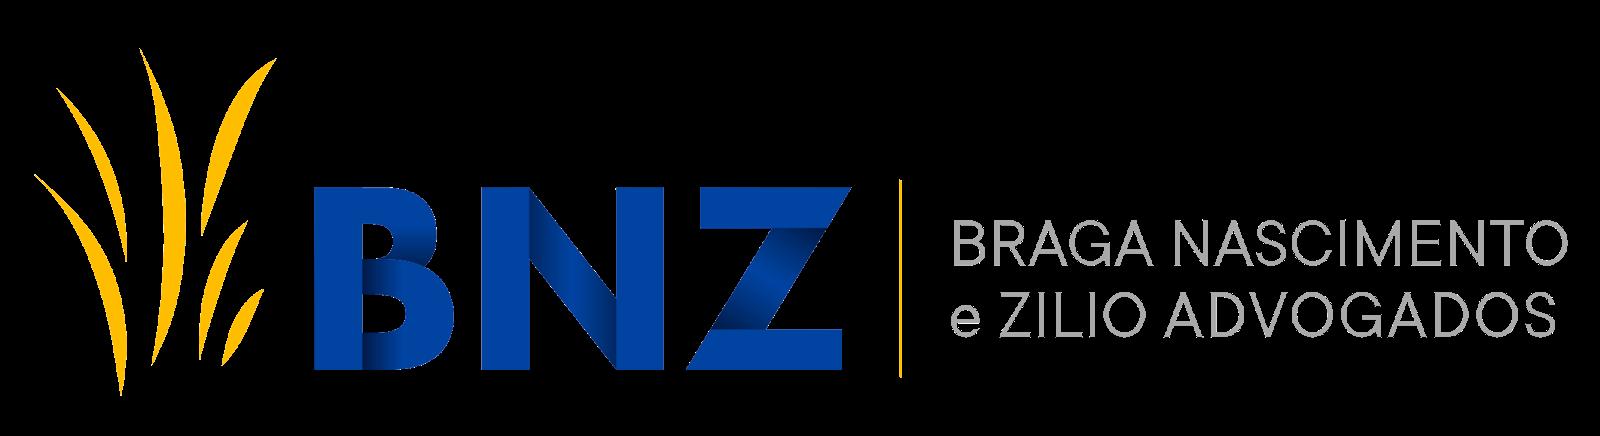 BNZ Blog